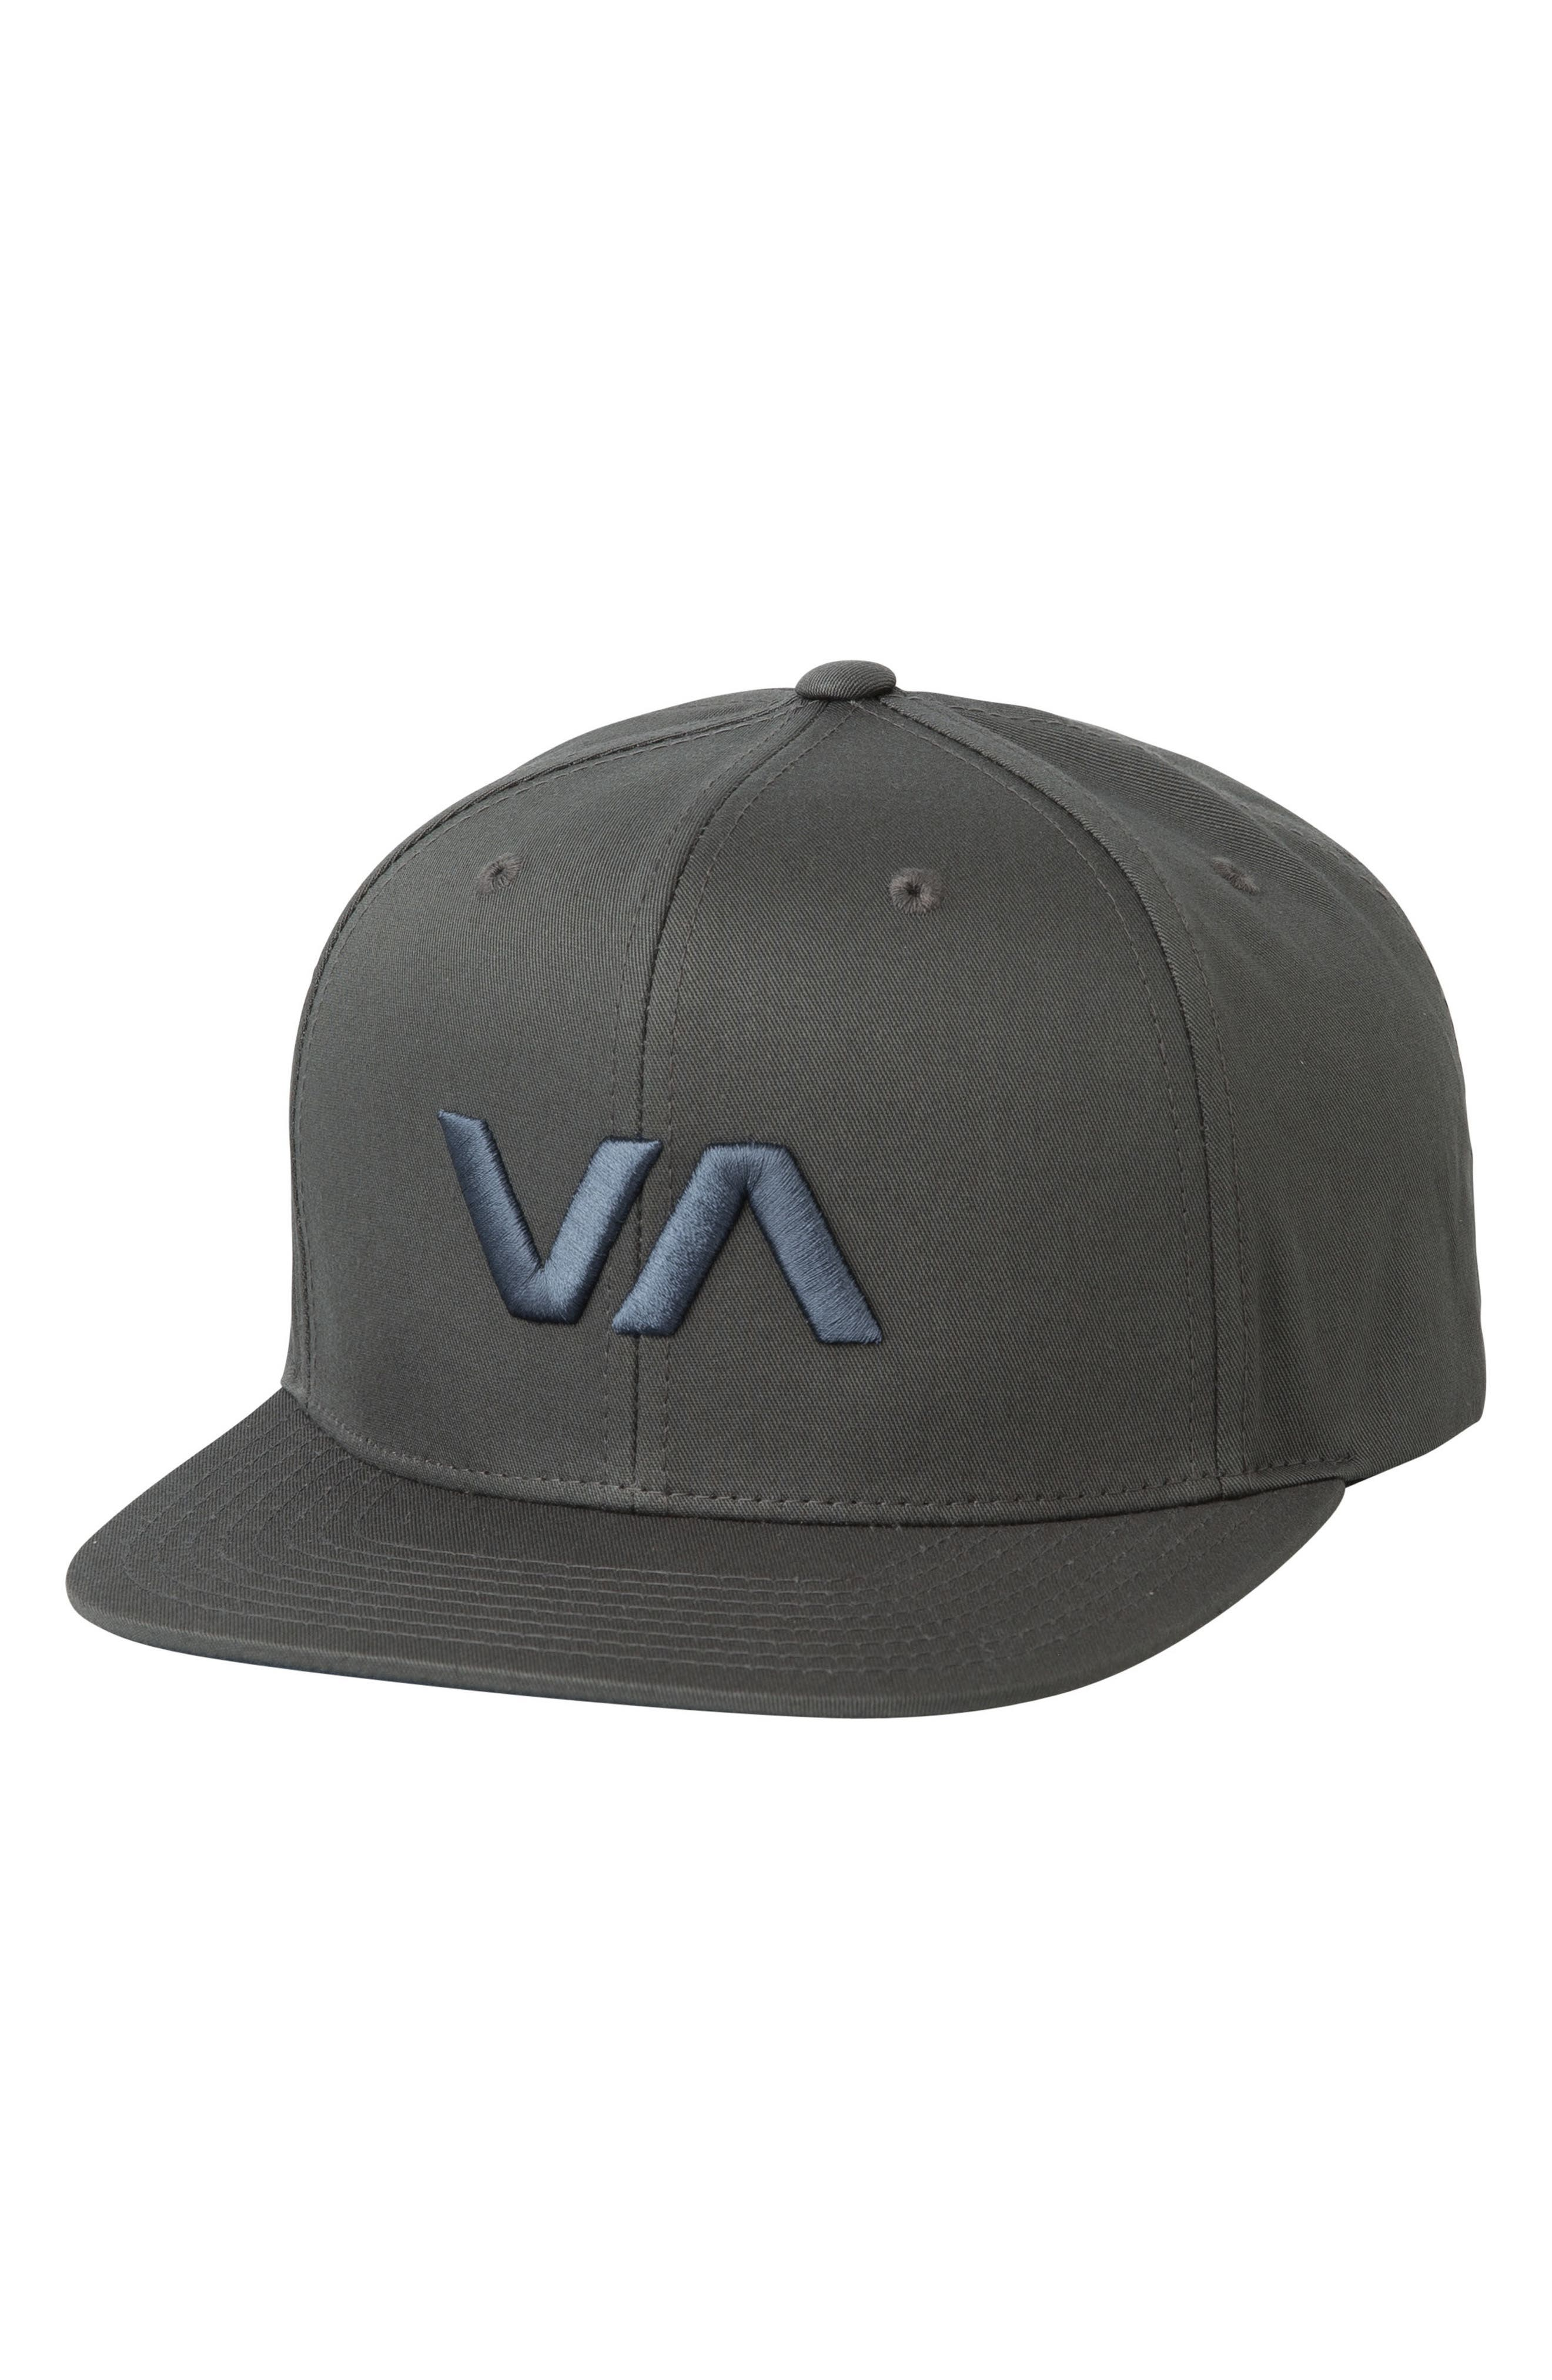 RVCA 'VA' Snapback Hat